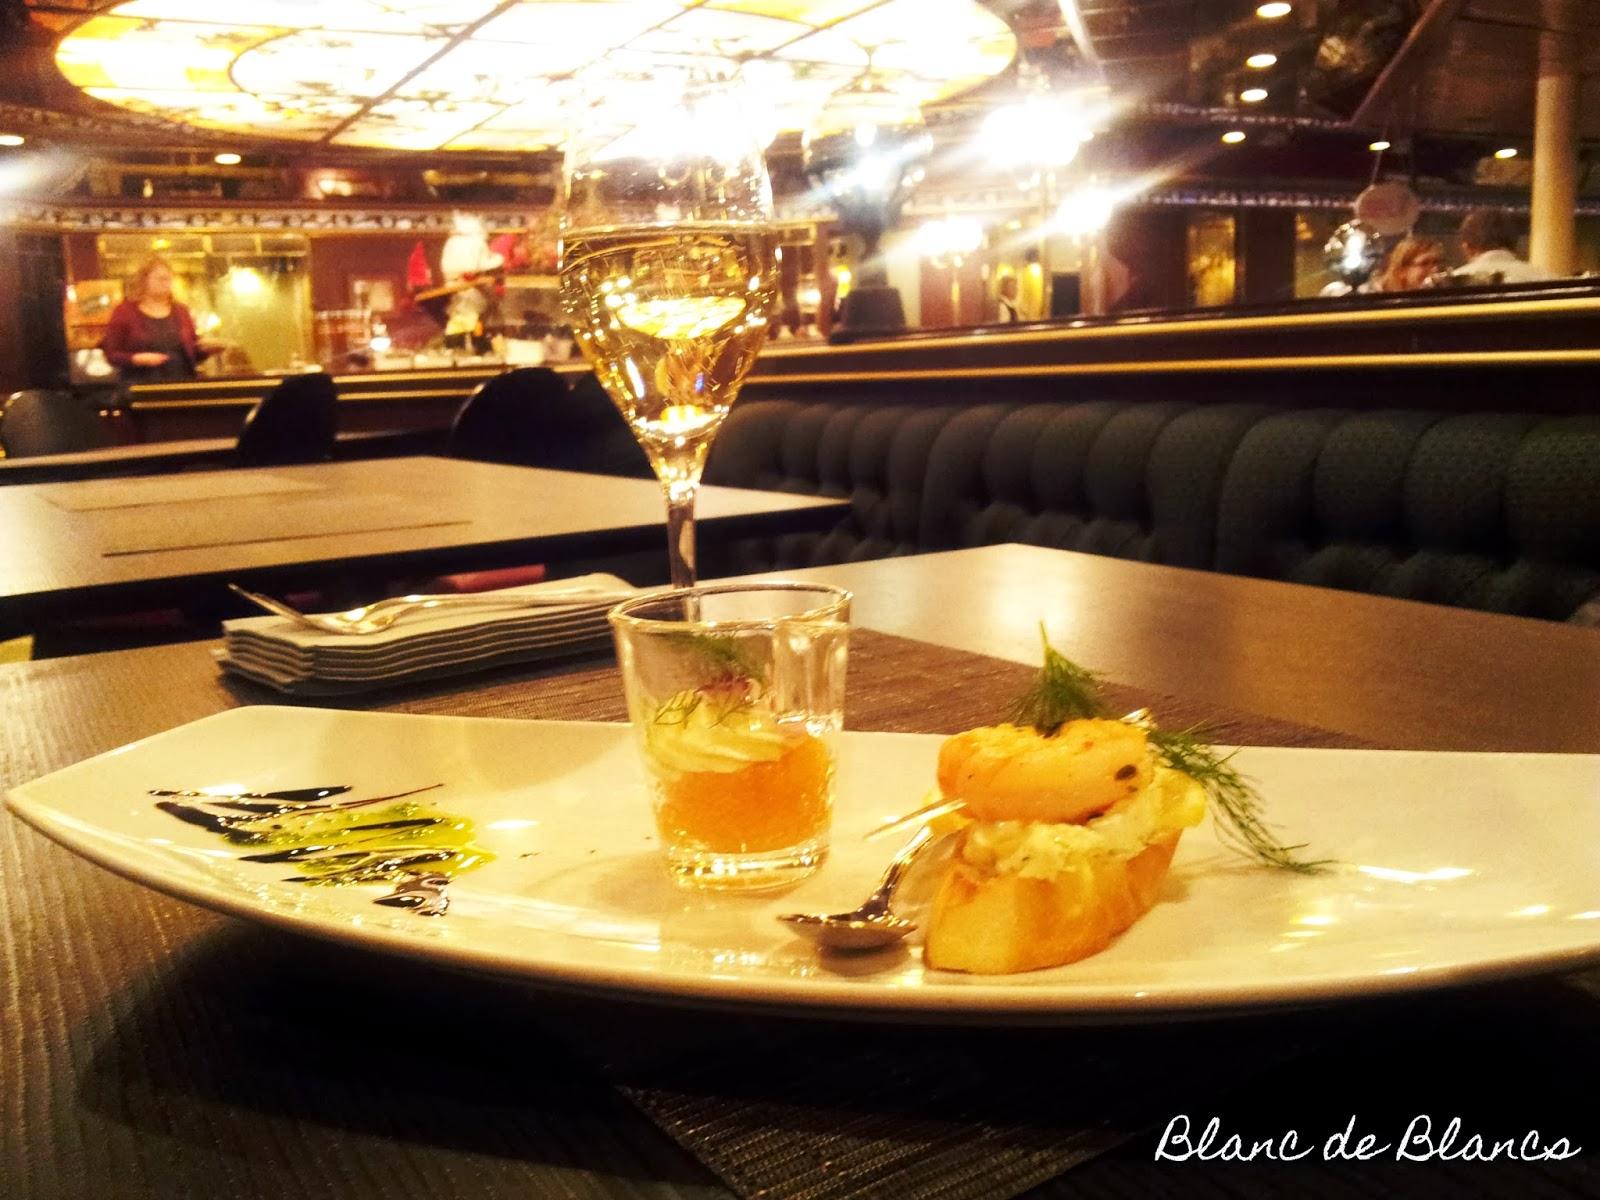 Samppanjaa ja mereneläviä - www.blancdeblancs.fi